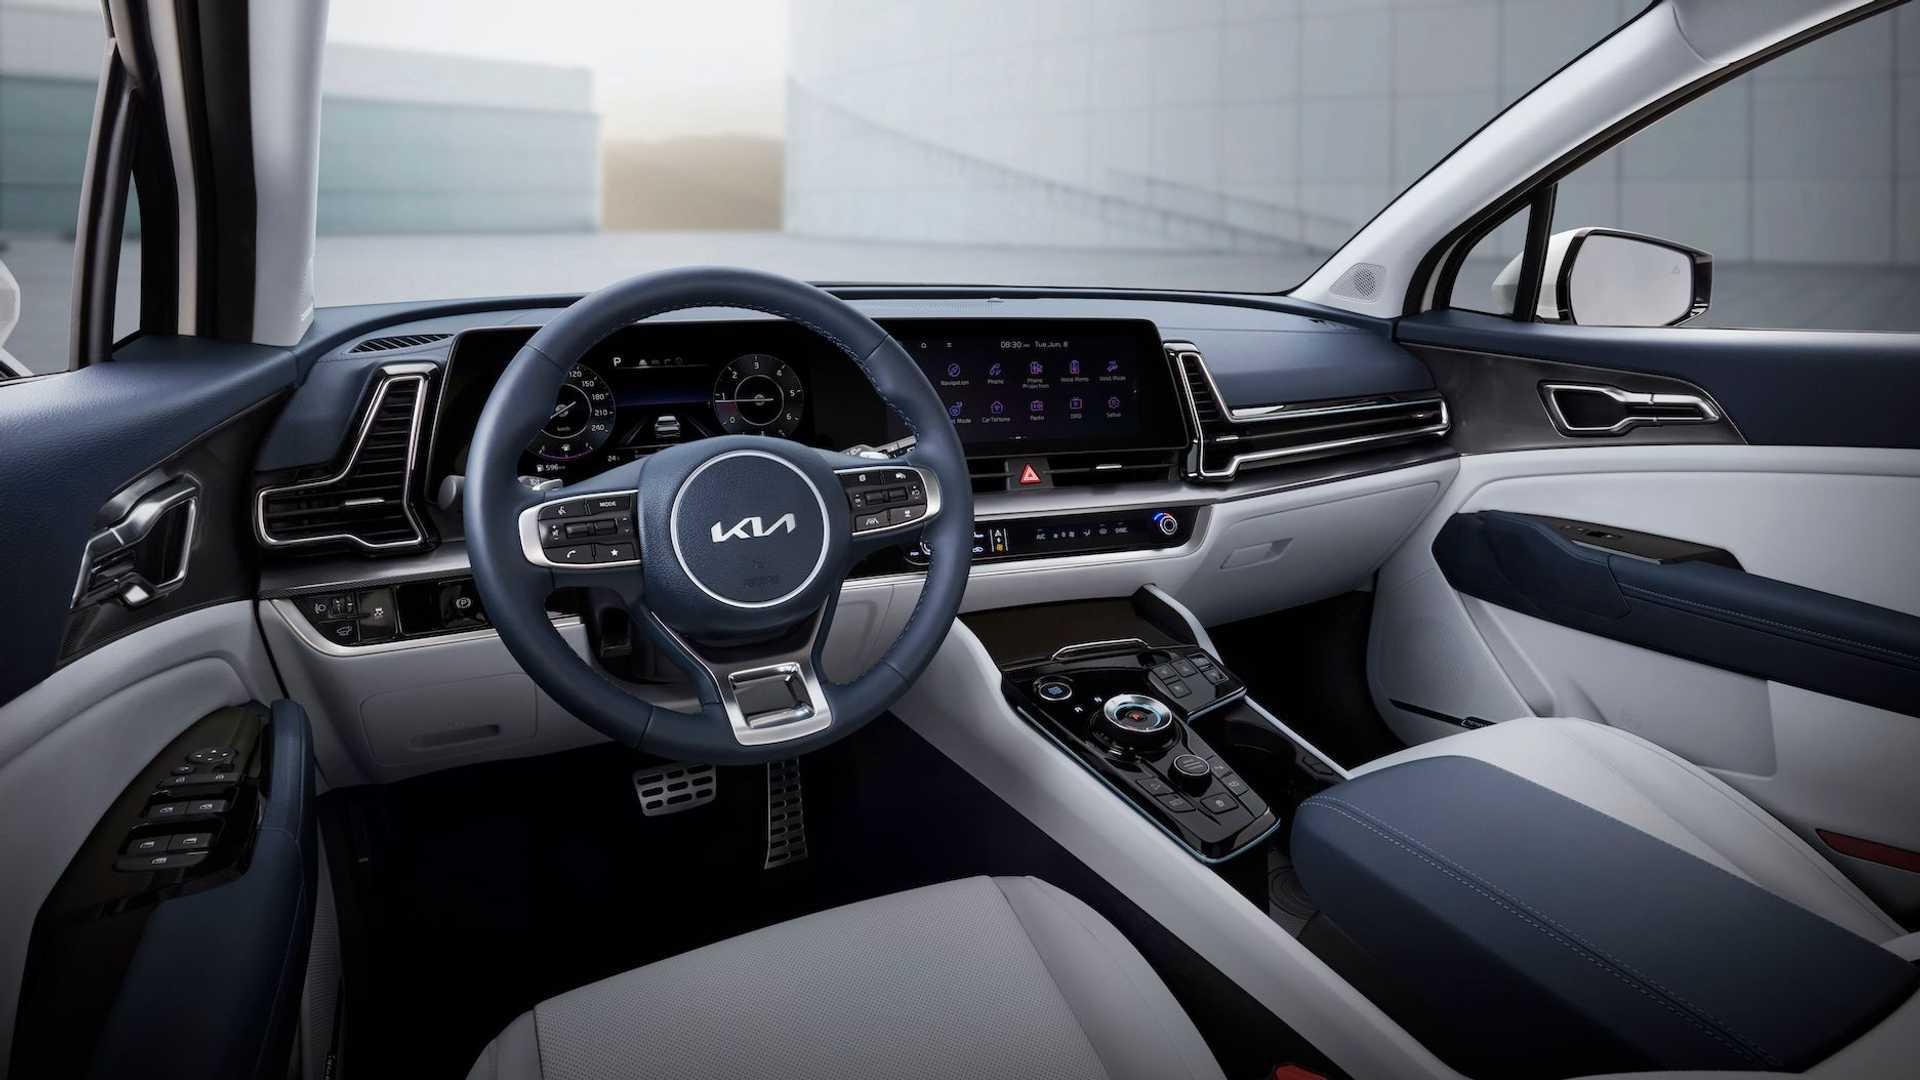 2022-kia-sportage-interior-dashboard.jpg